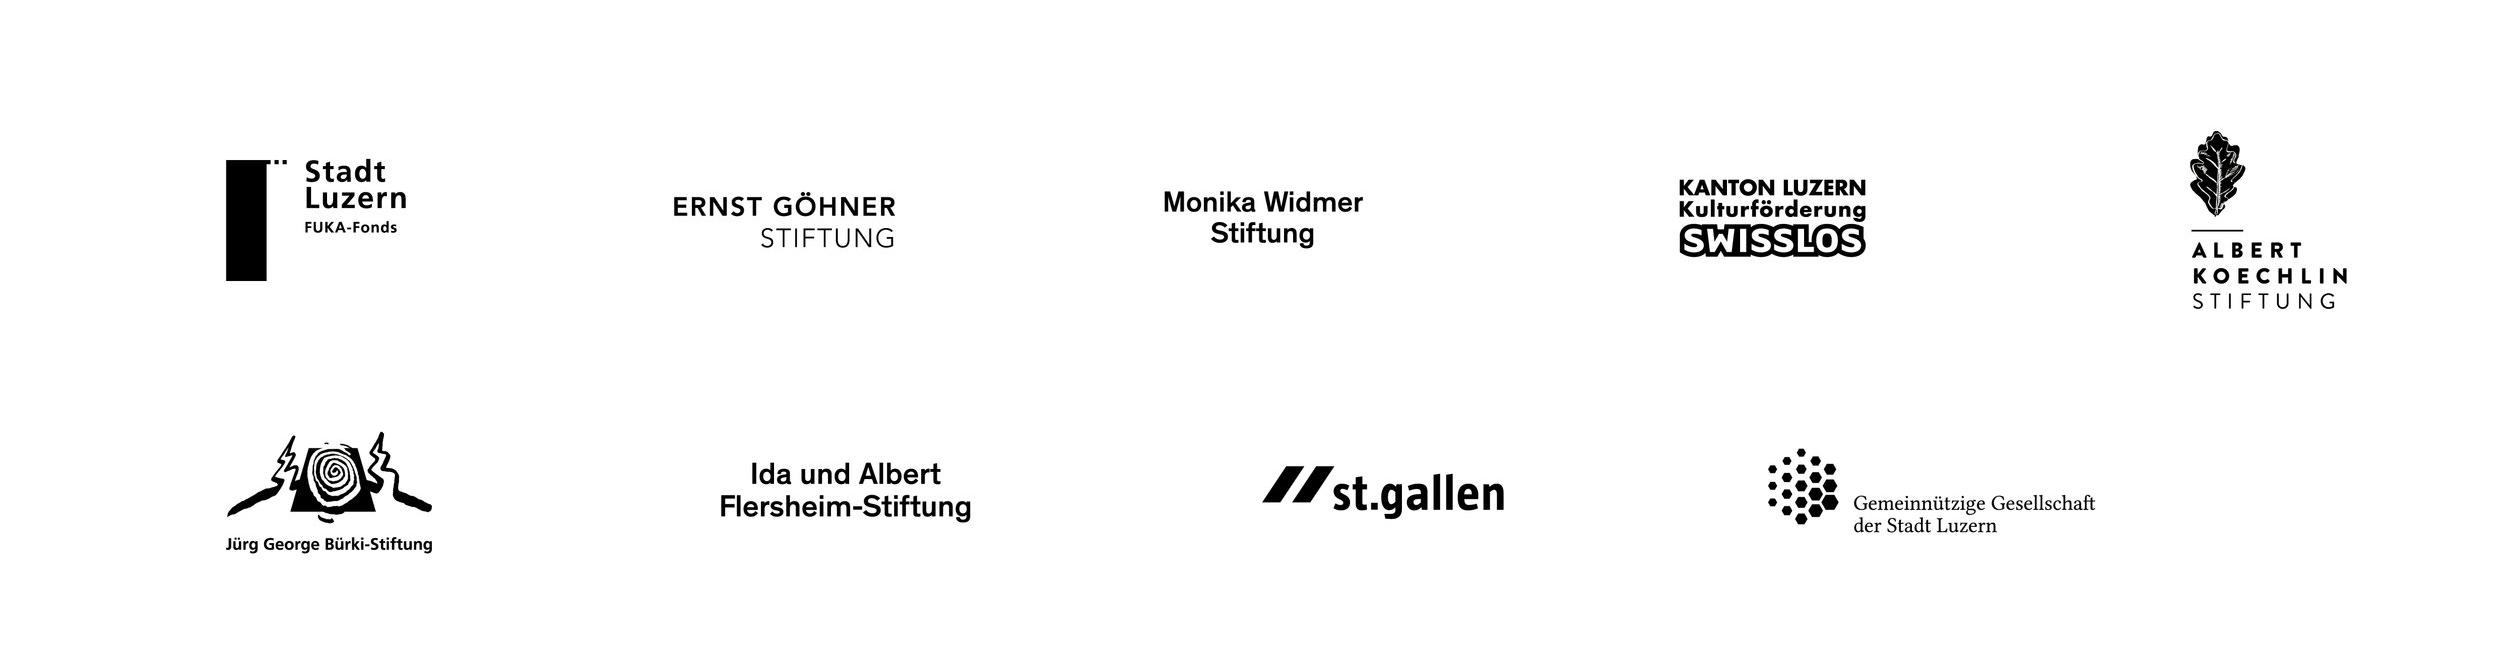 TRV_15Sekunden_Logos_Website.jpg